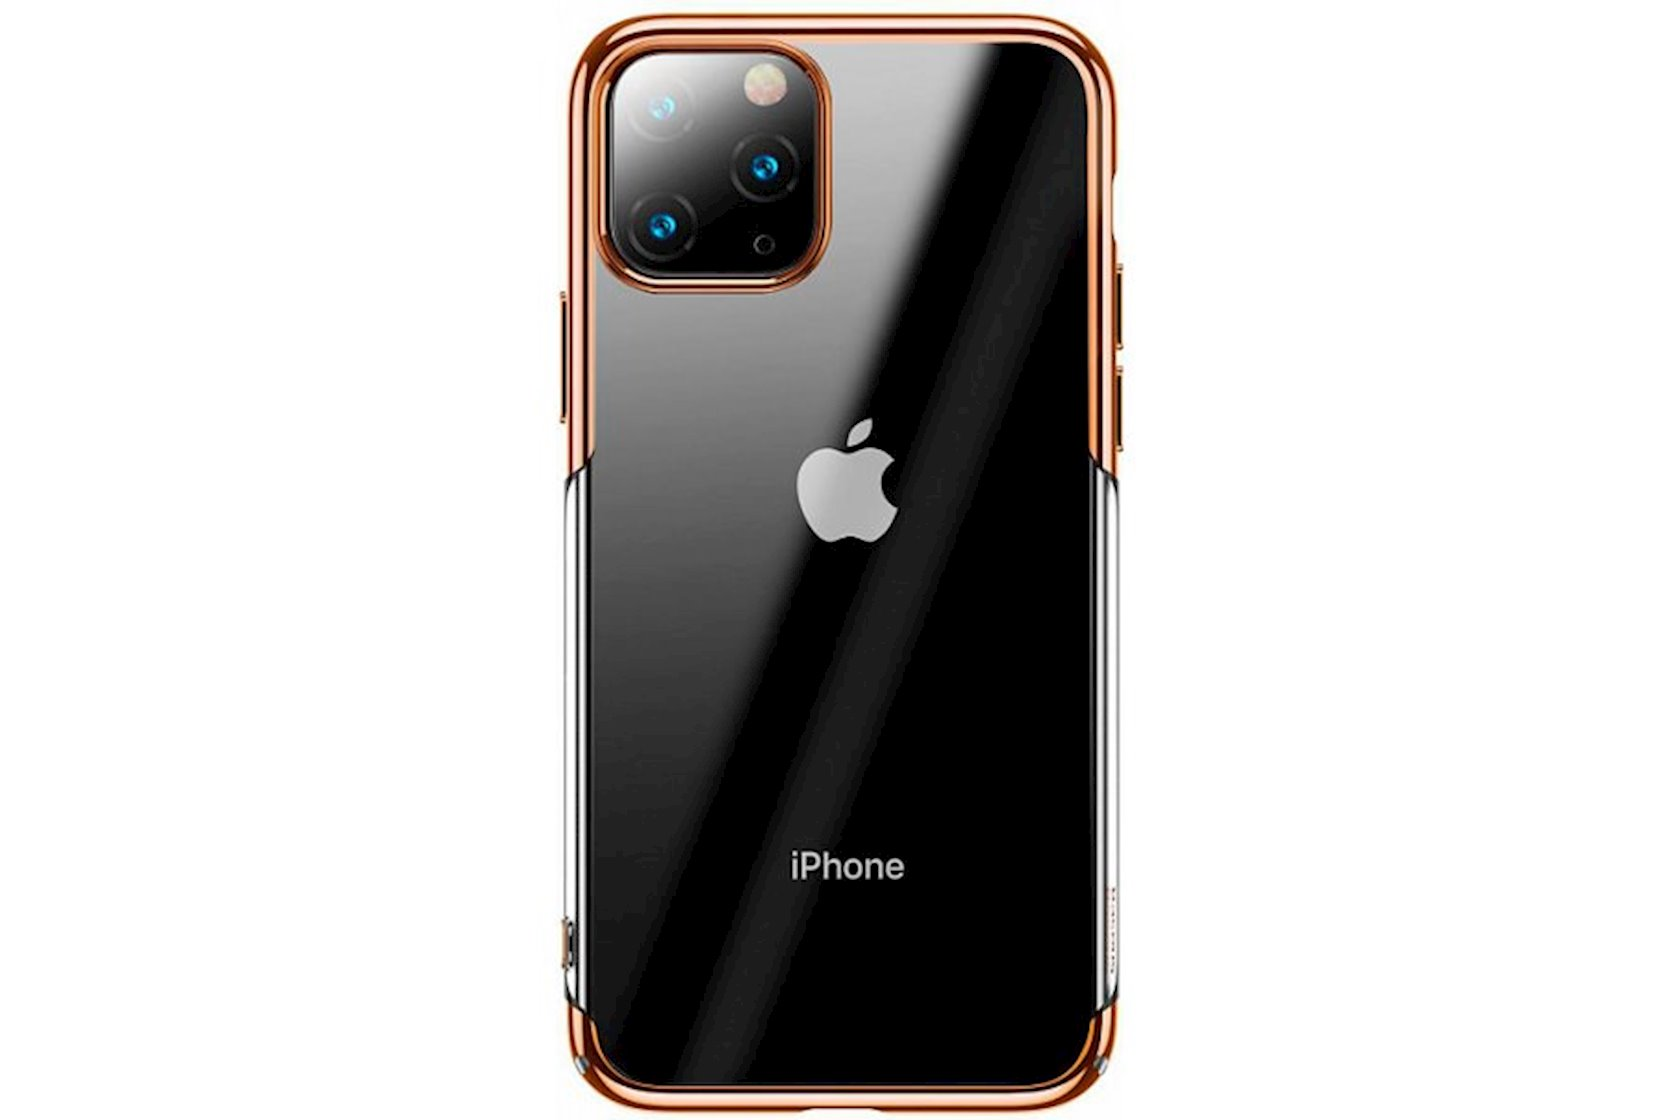 Çexol Baseus WIAPIPH65S-DW0V Glitter  iPhone 11 Pro Max üçün, qızılı